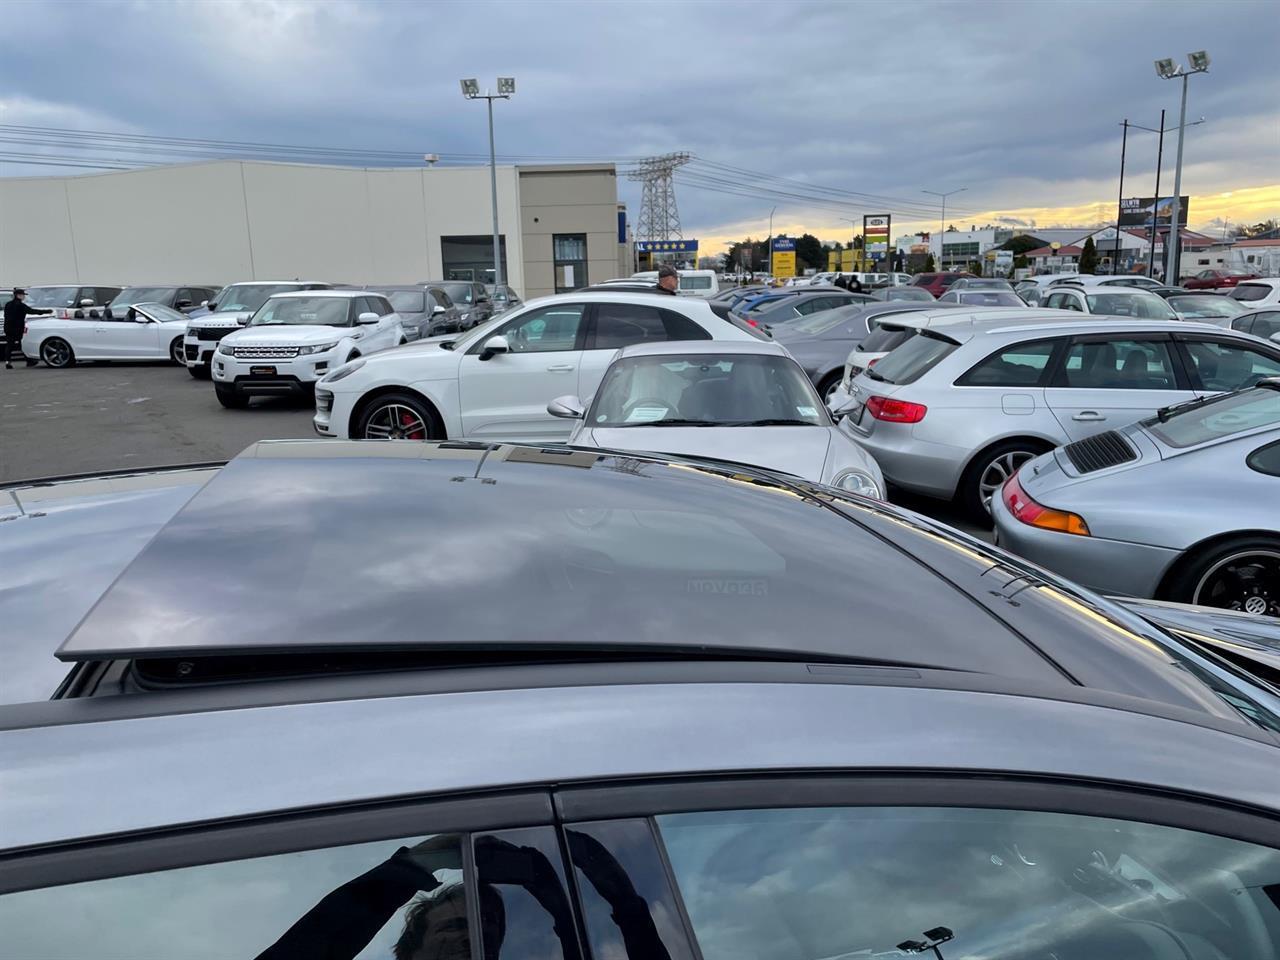 image-9, 2019 MercedesBenz A180 1.3T 7 Speed New Model at Christchurch